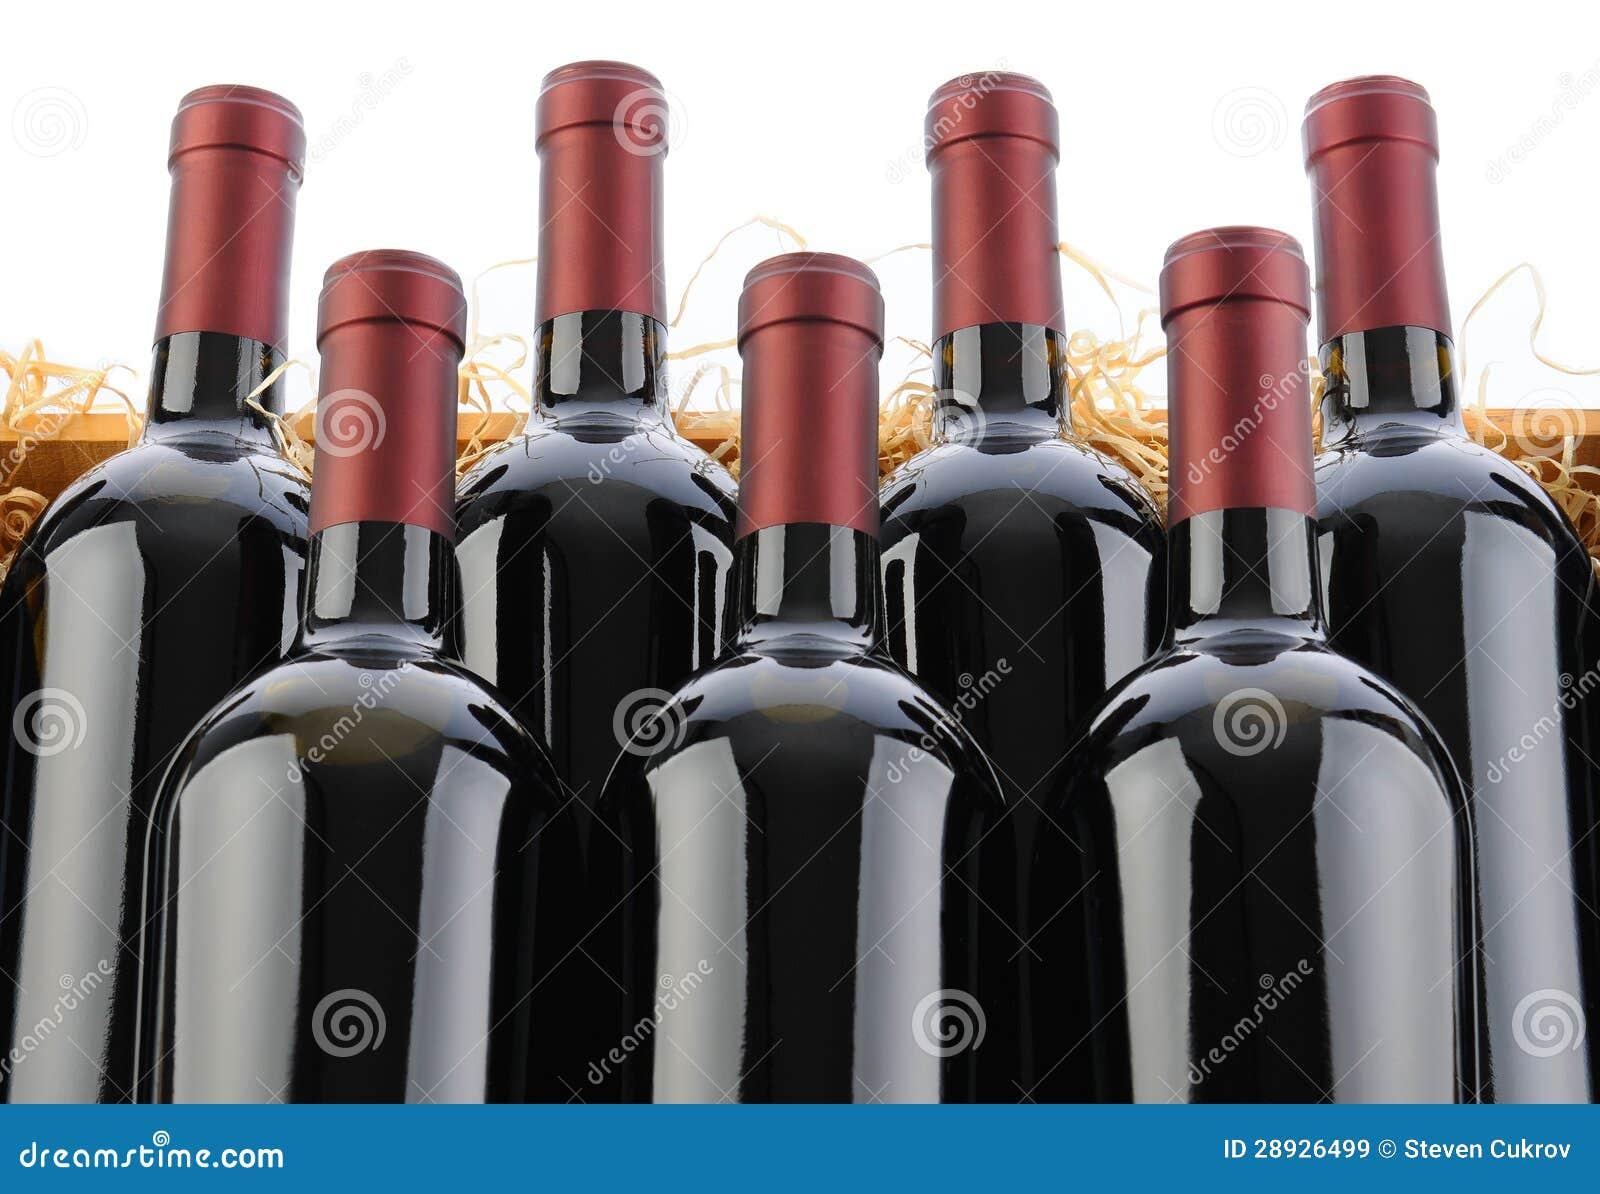 Cabernet - sauvignon Wine buteljerar i spjällåda med sugrör